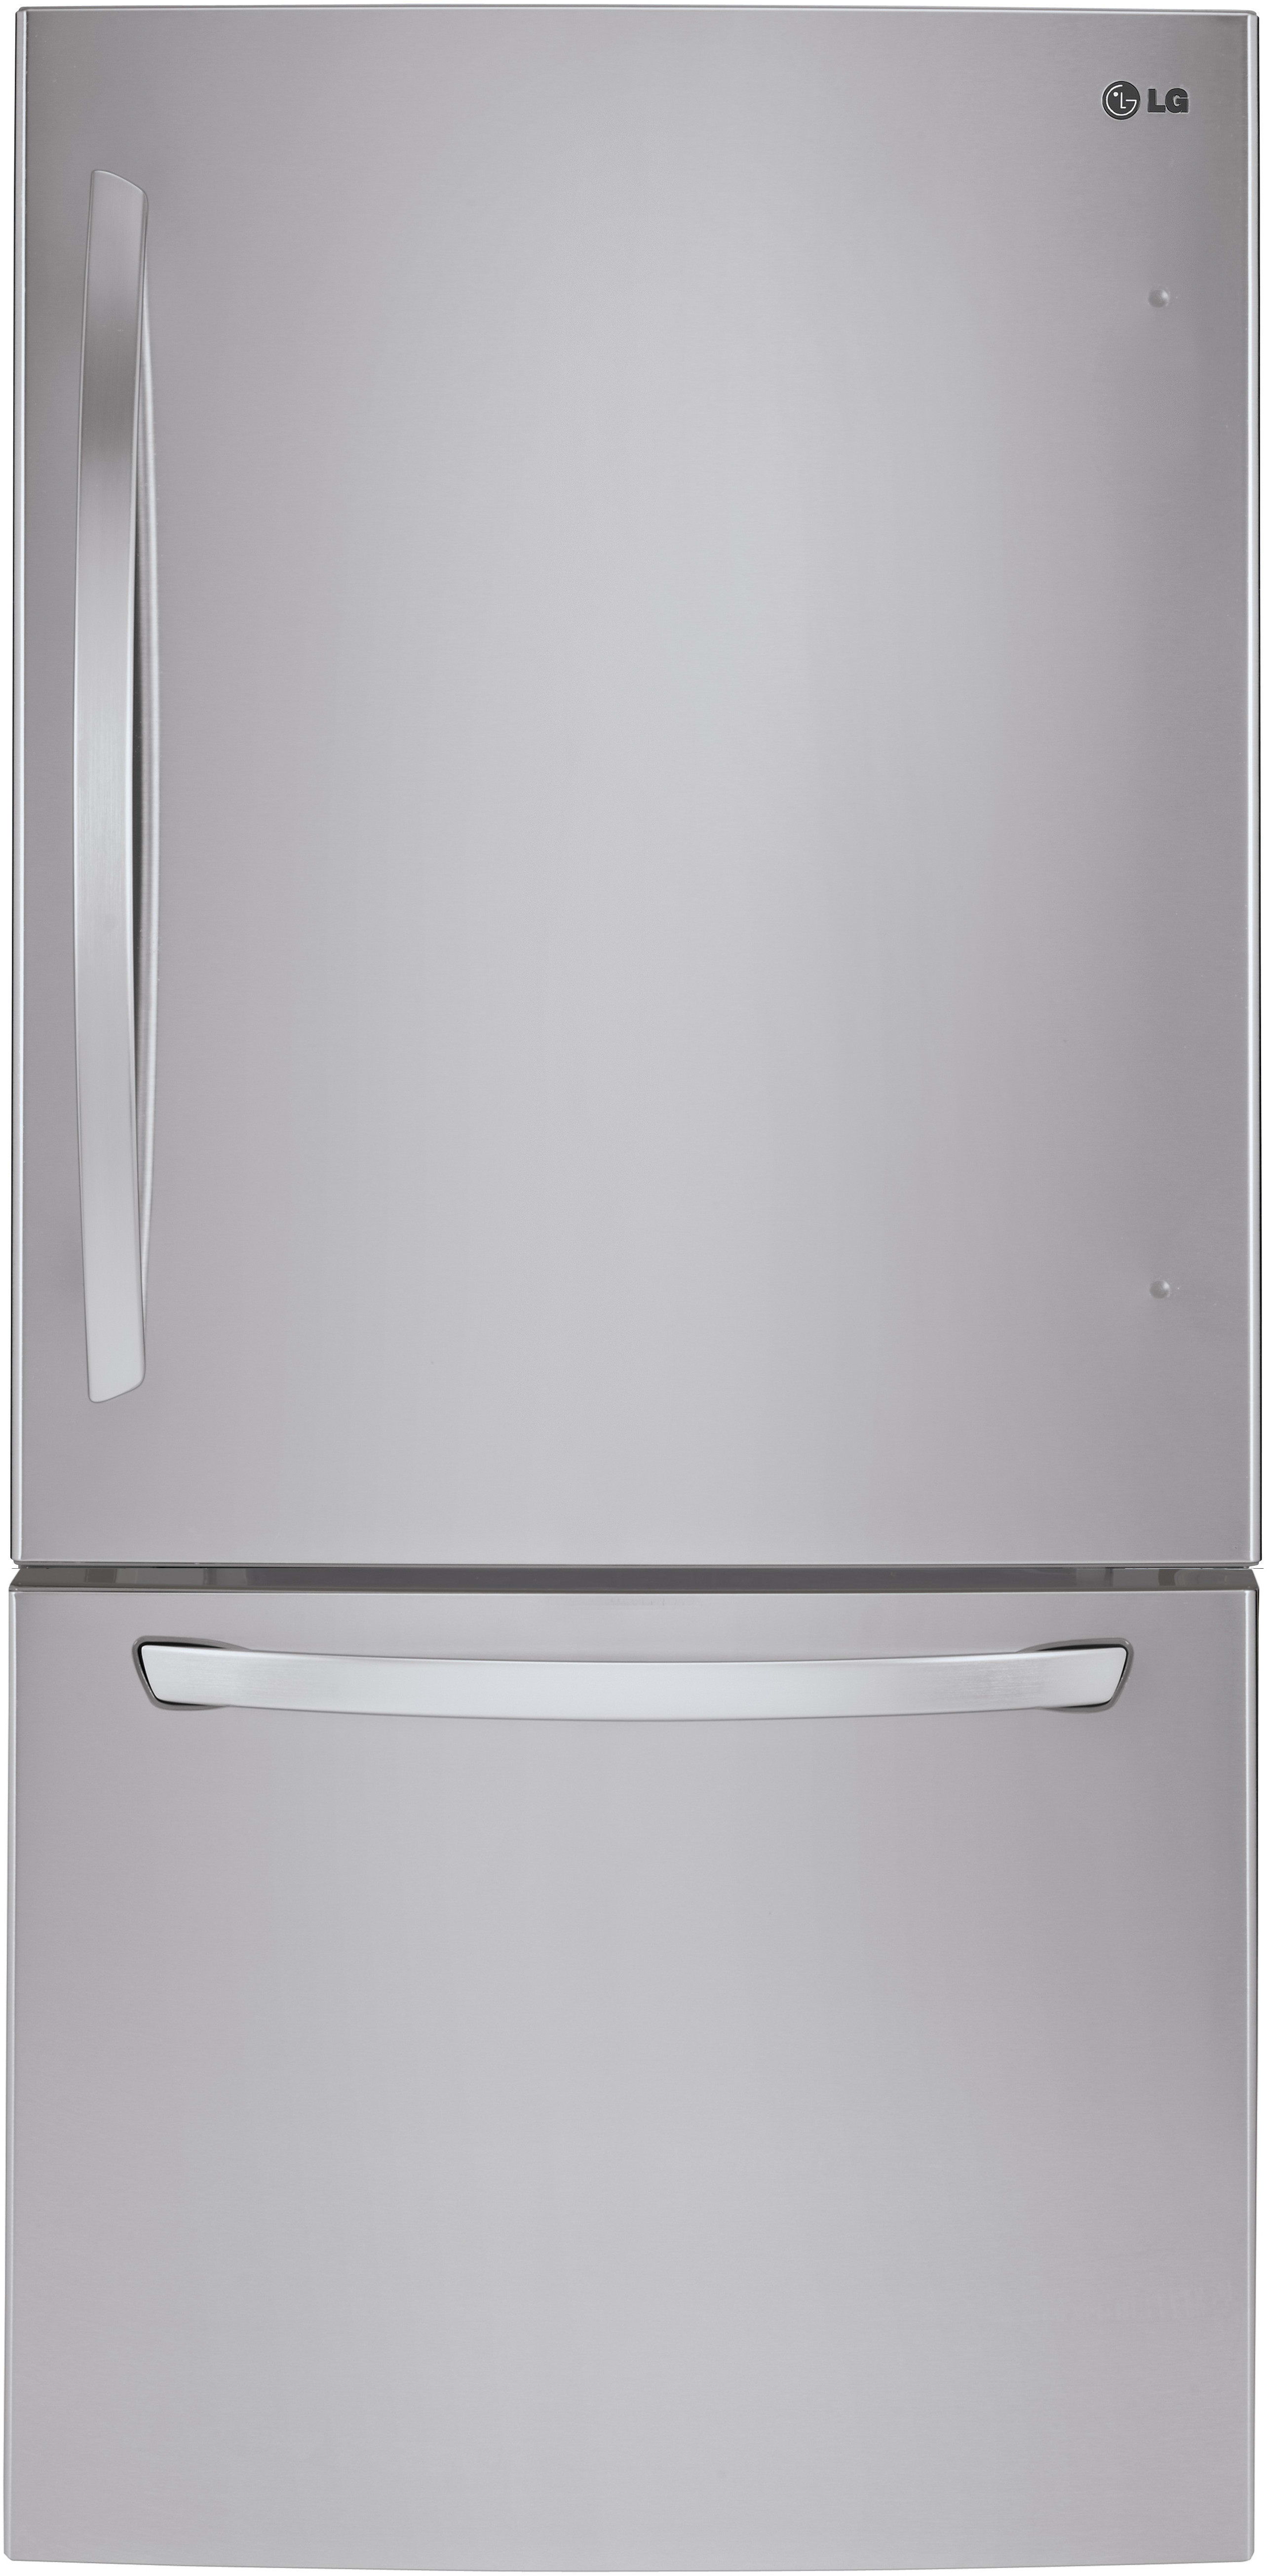 Lg Ldcs24223s 33 Inch Bottom Freezer Refrigerator With